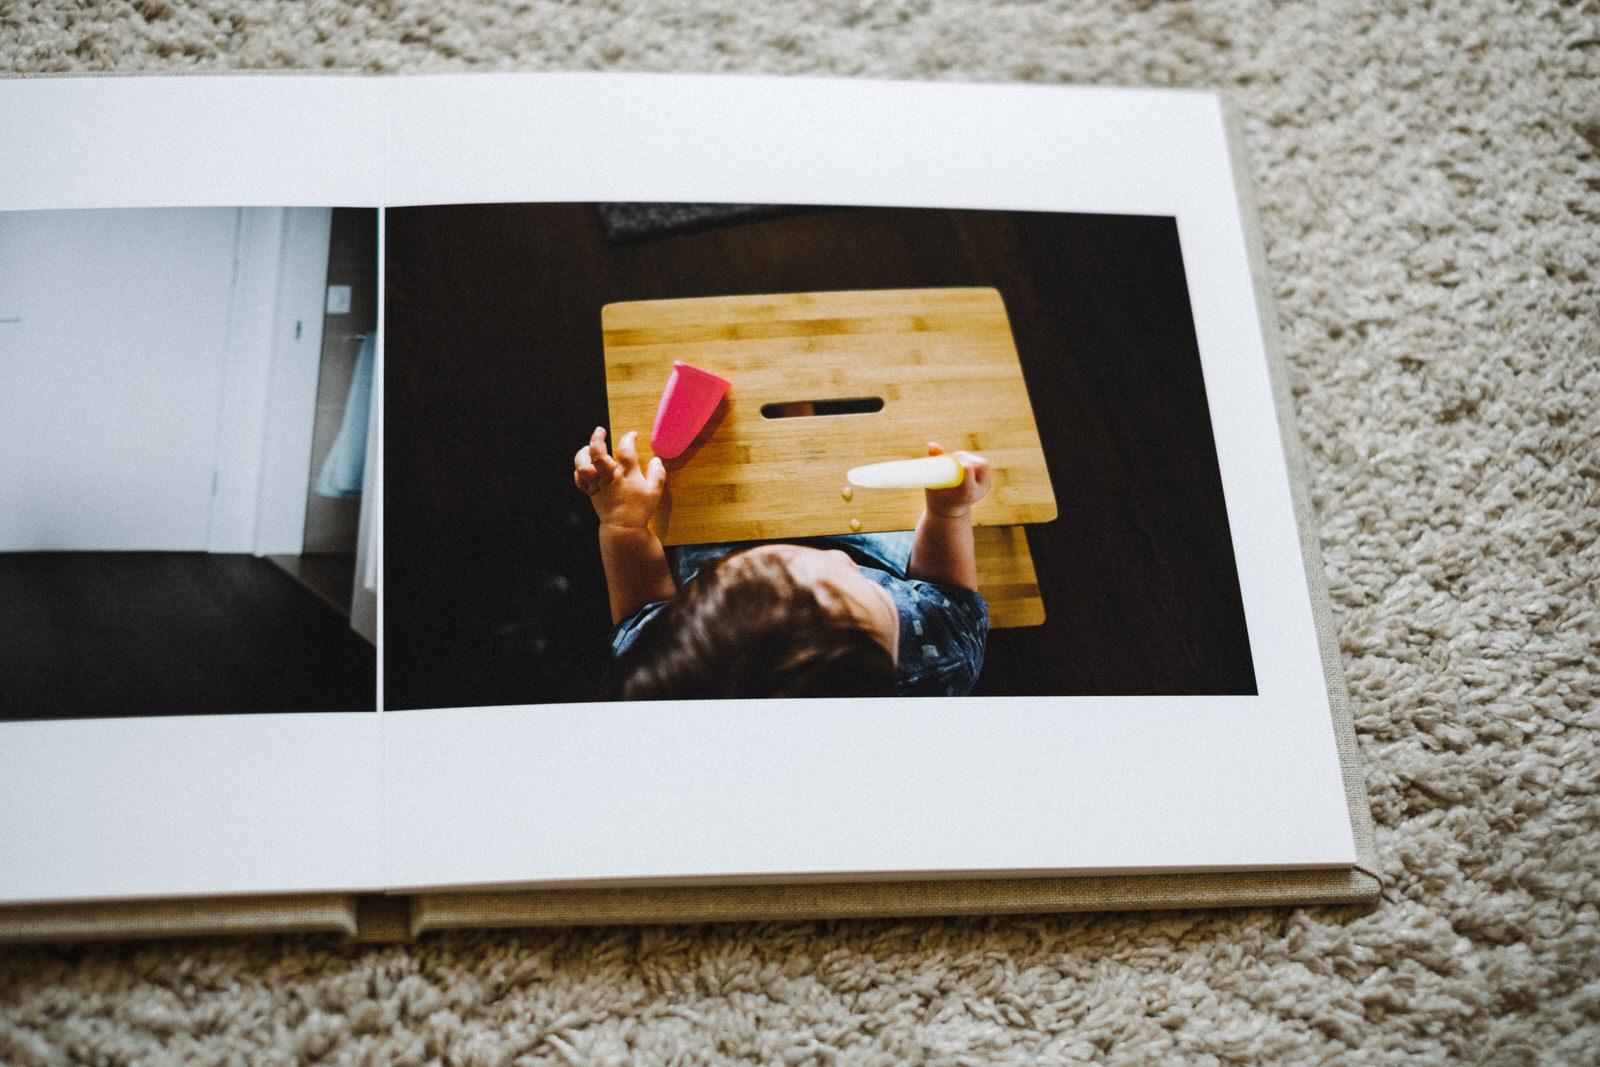 family-story-photos-photo-album-09.jpg